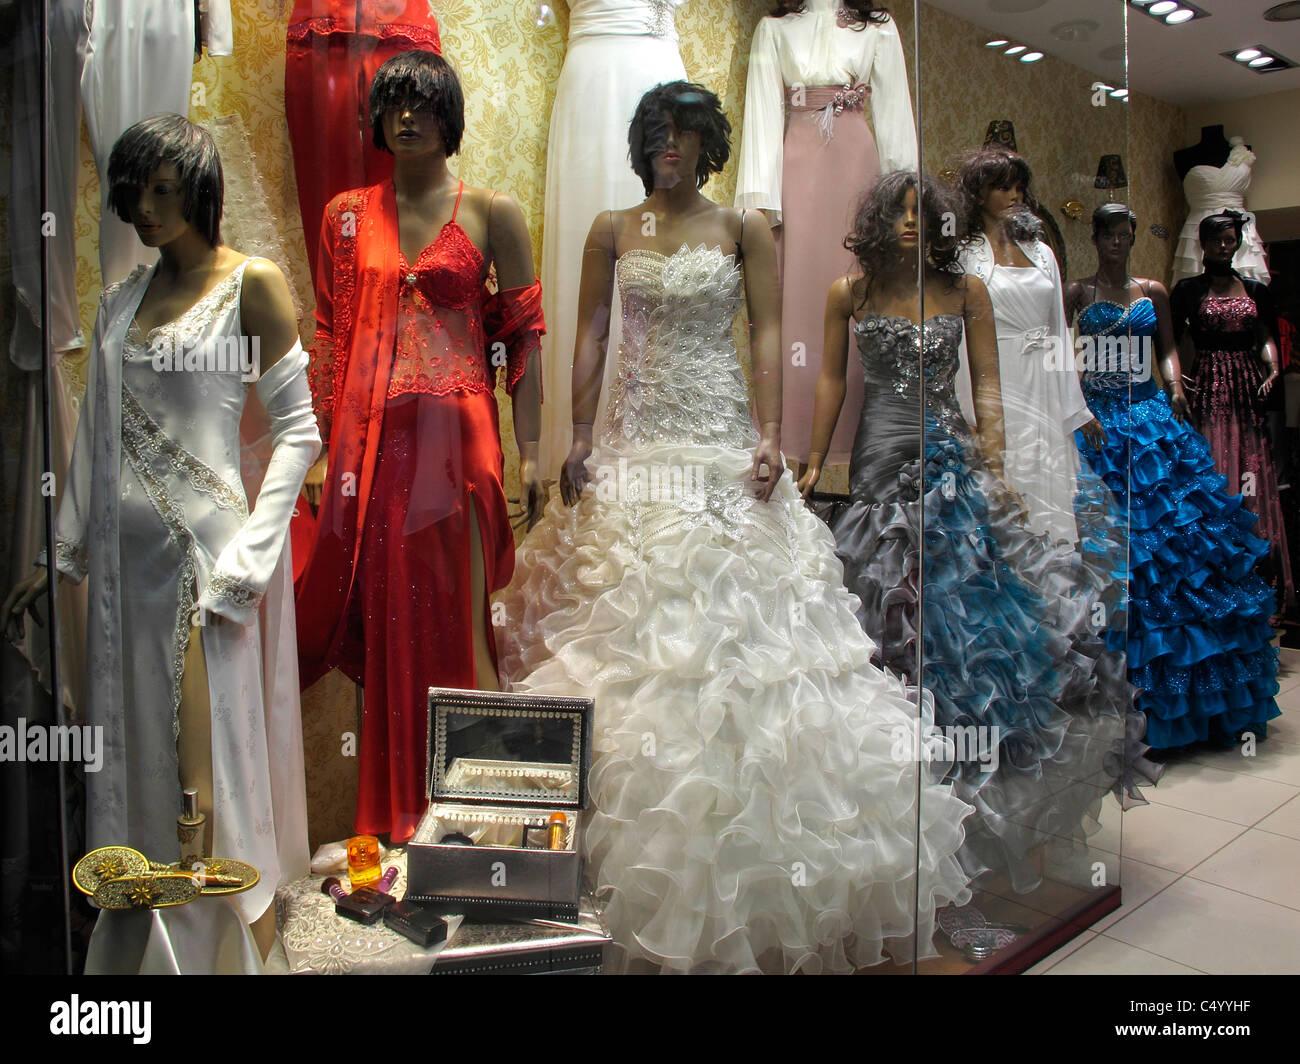 Sell Wedding Stock Photos & Sell Wedding Stock Images - Alamy